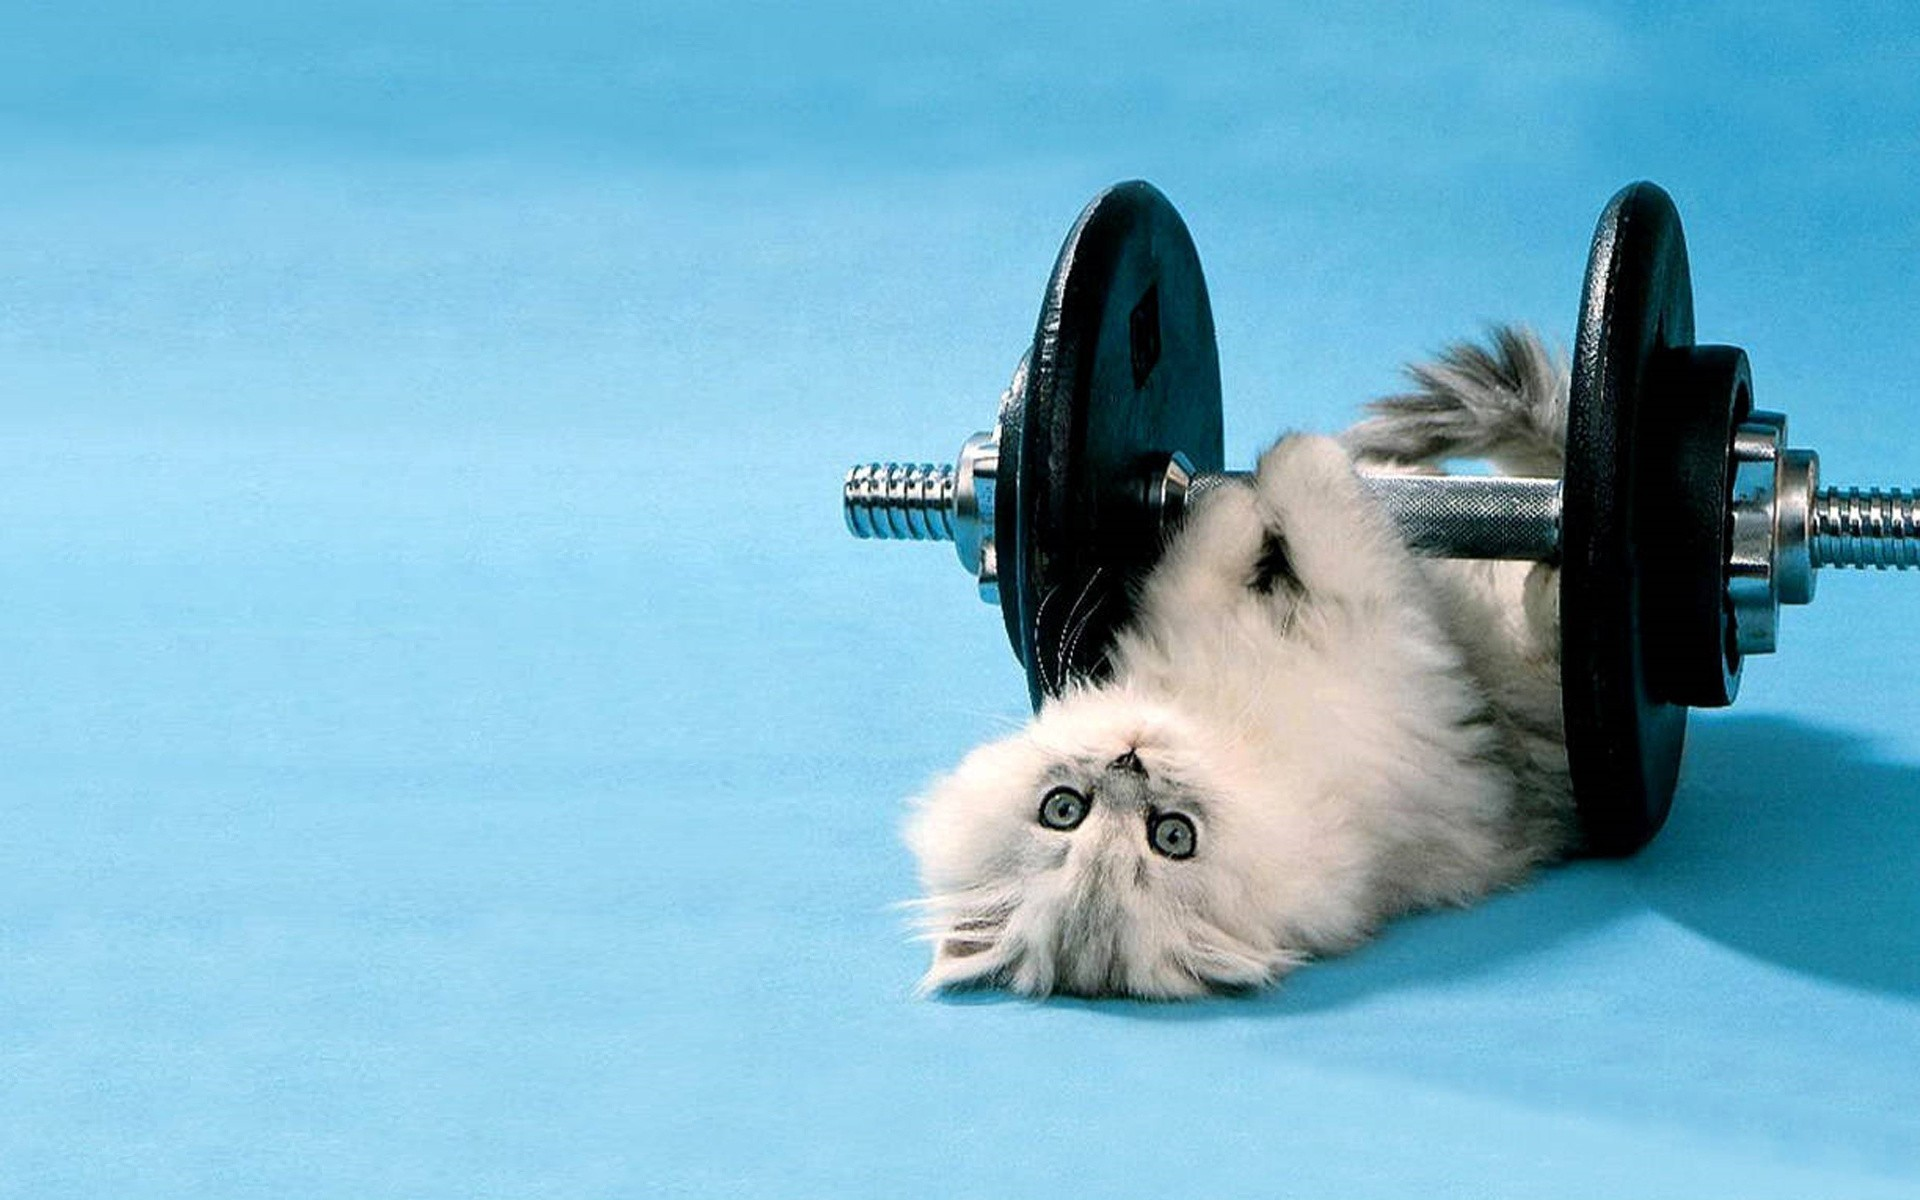 Cat Funny Animal HD Wallpaper